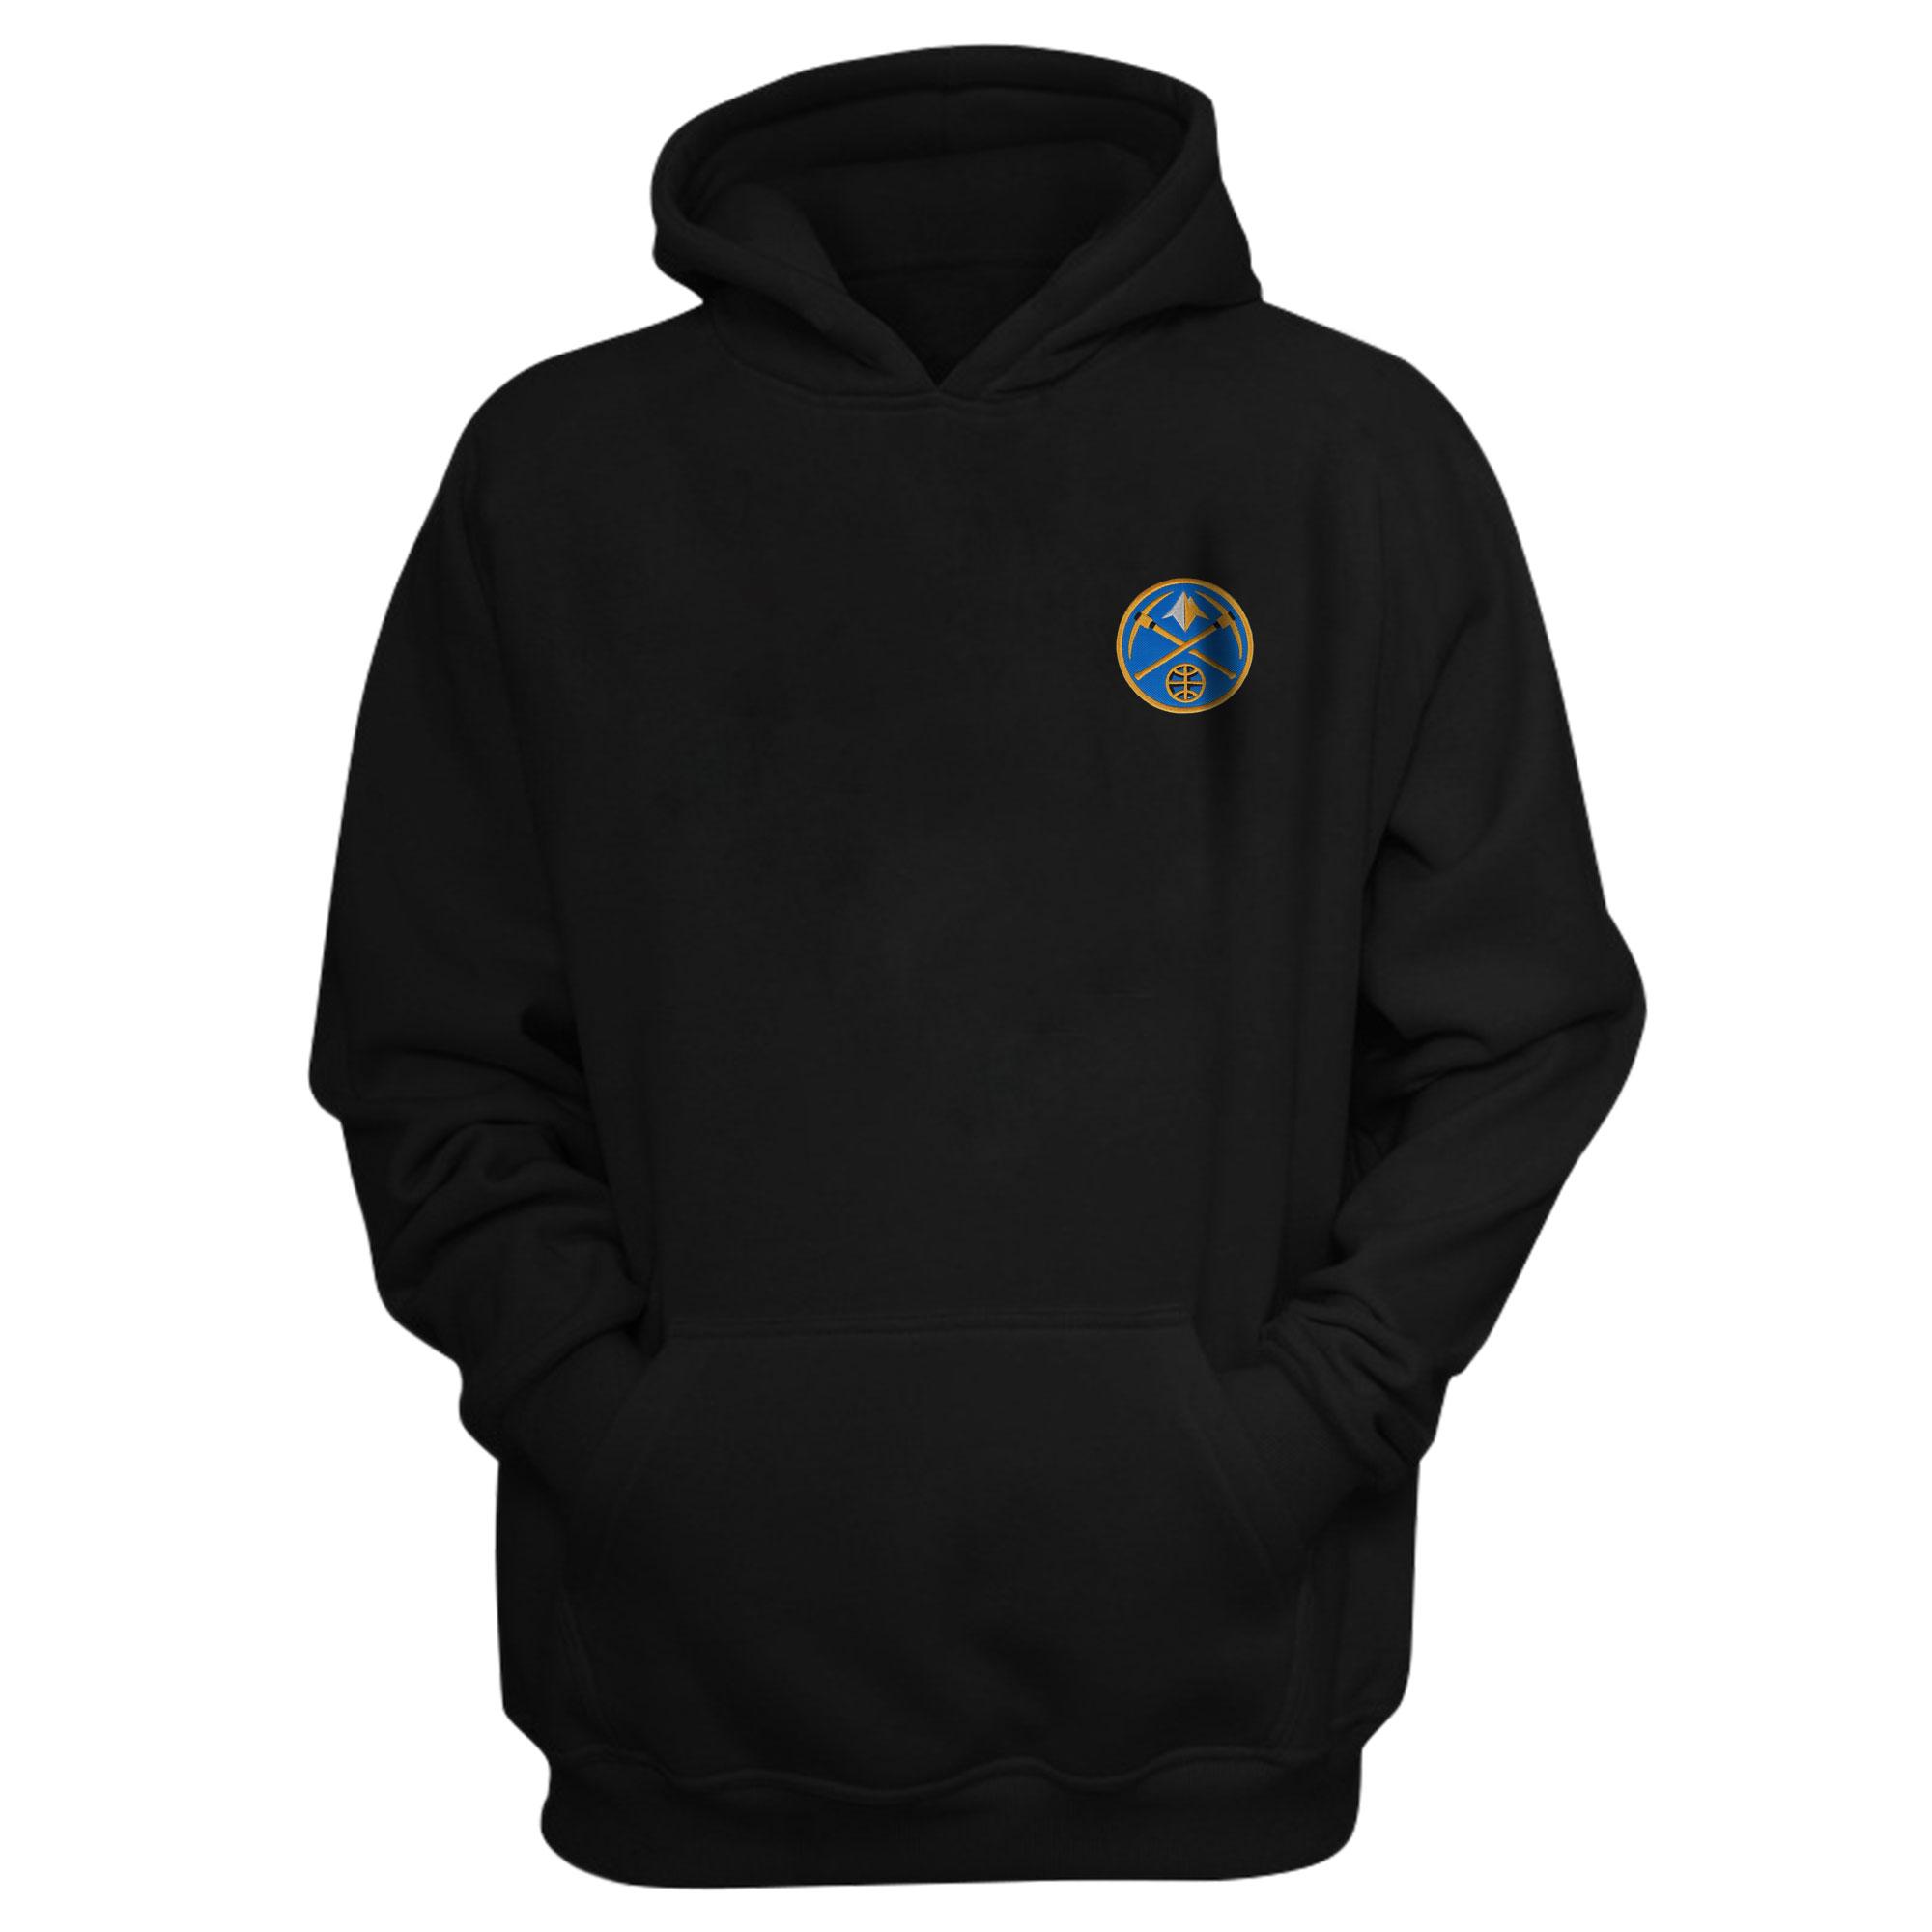 Denver Nuggets Hoodie (Örme)  (HD-BLC-EMBR-NUGGETS)